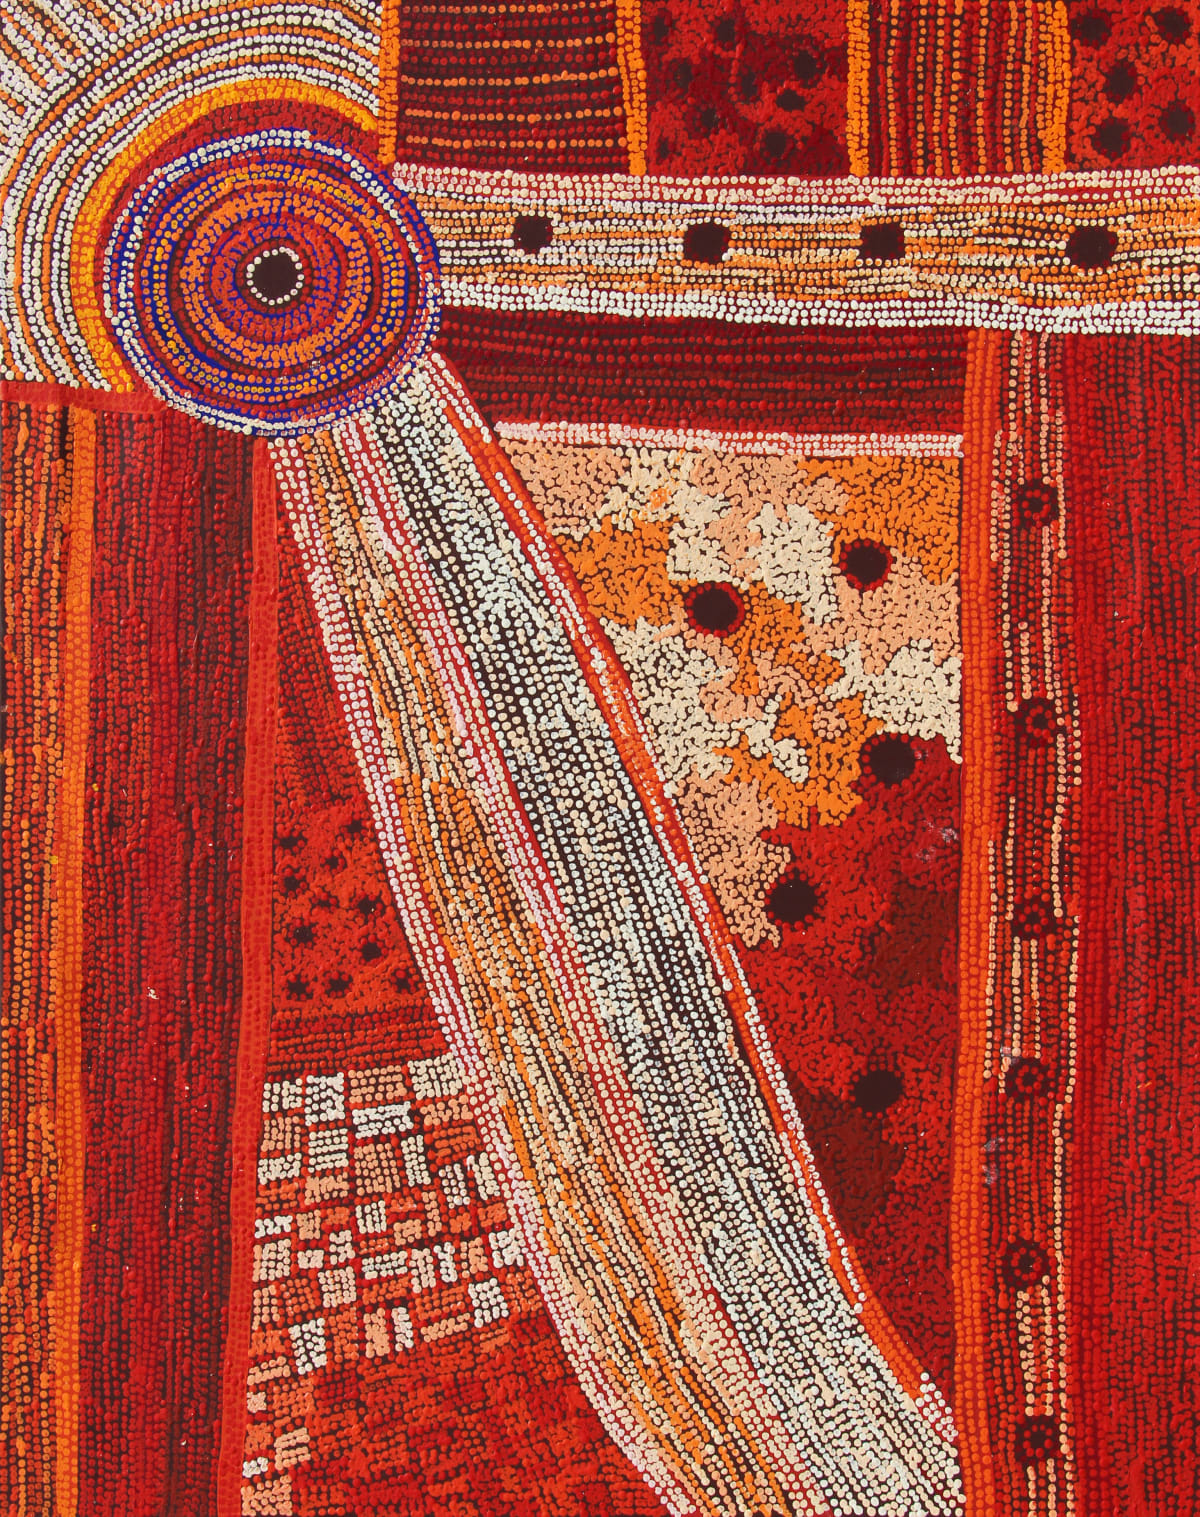 Raylene Walatinna Ngayuku Ngura (My Country), 2019 Acrylic on Linen 122 x 152cm